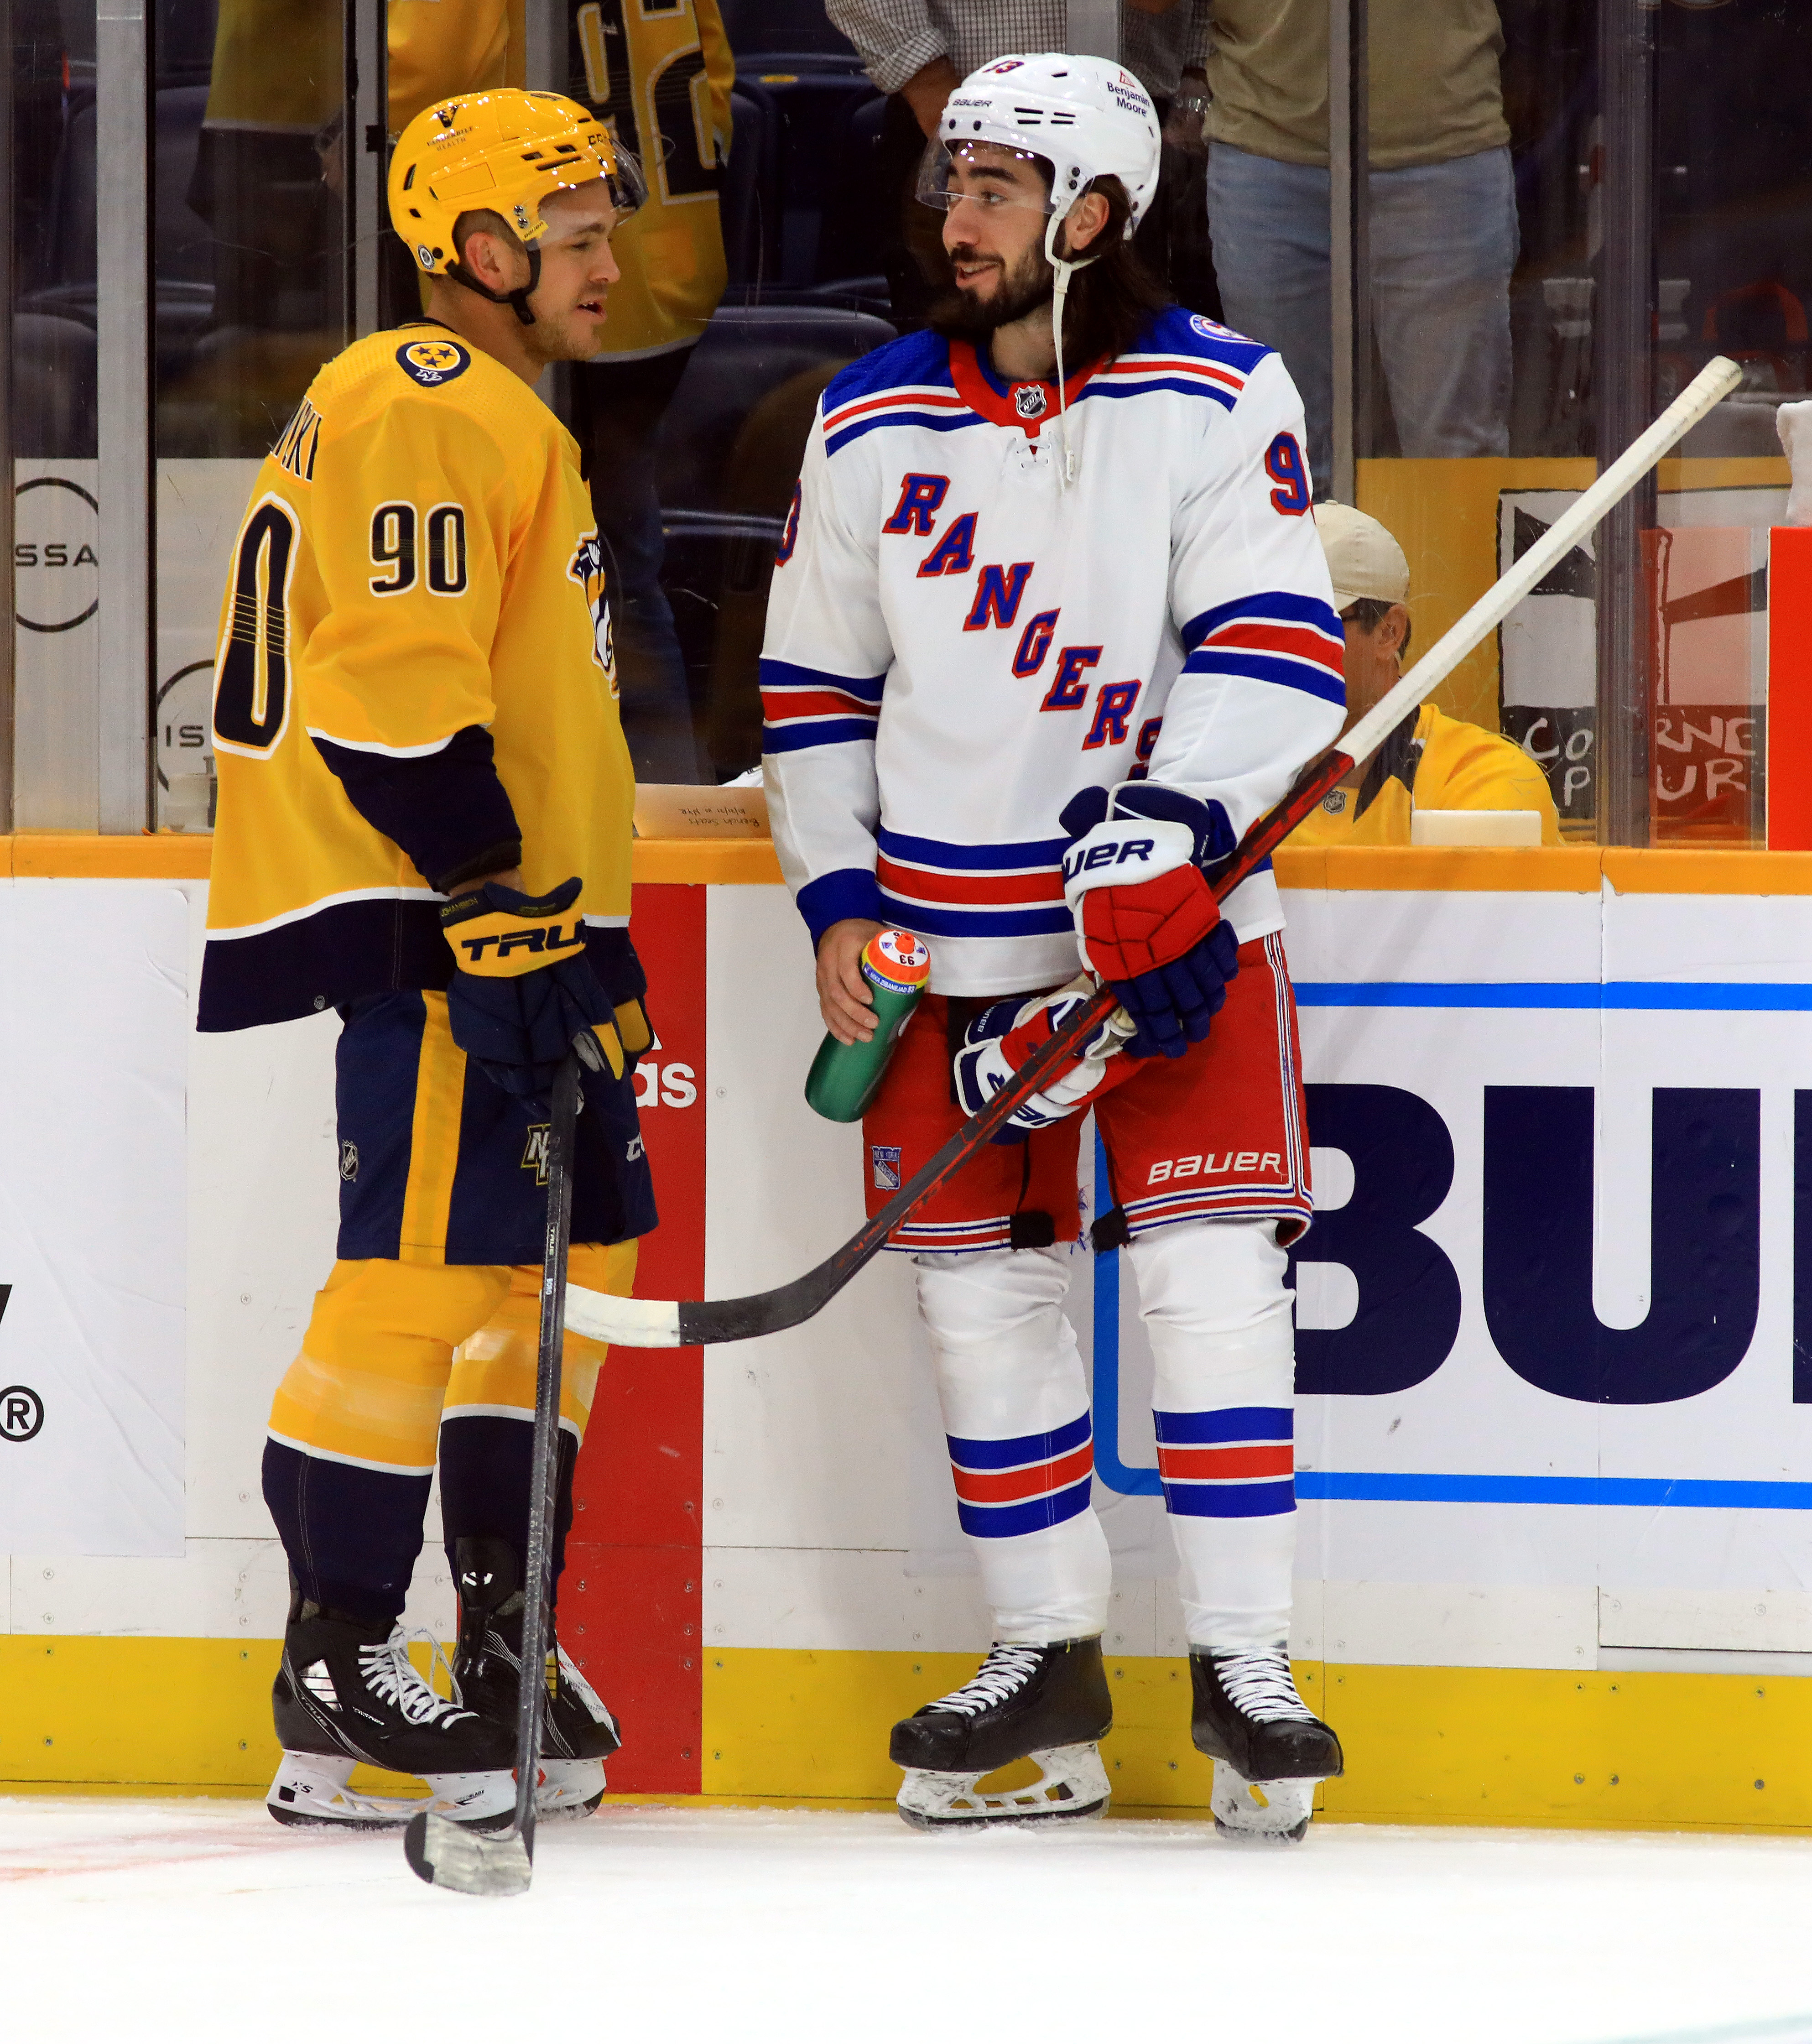 NHL: OCT 21 Rangers at Predators